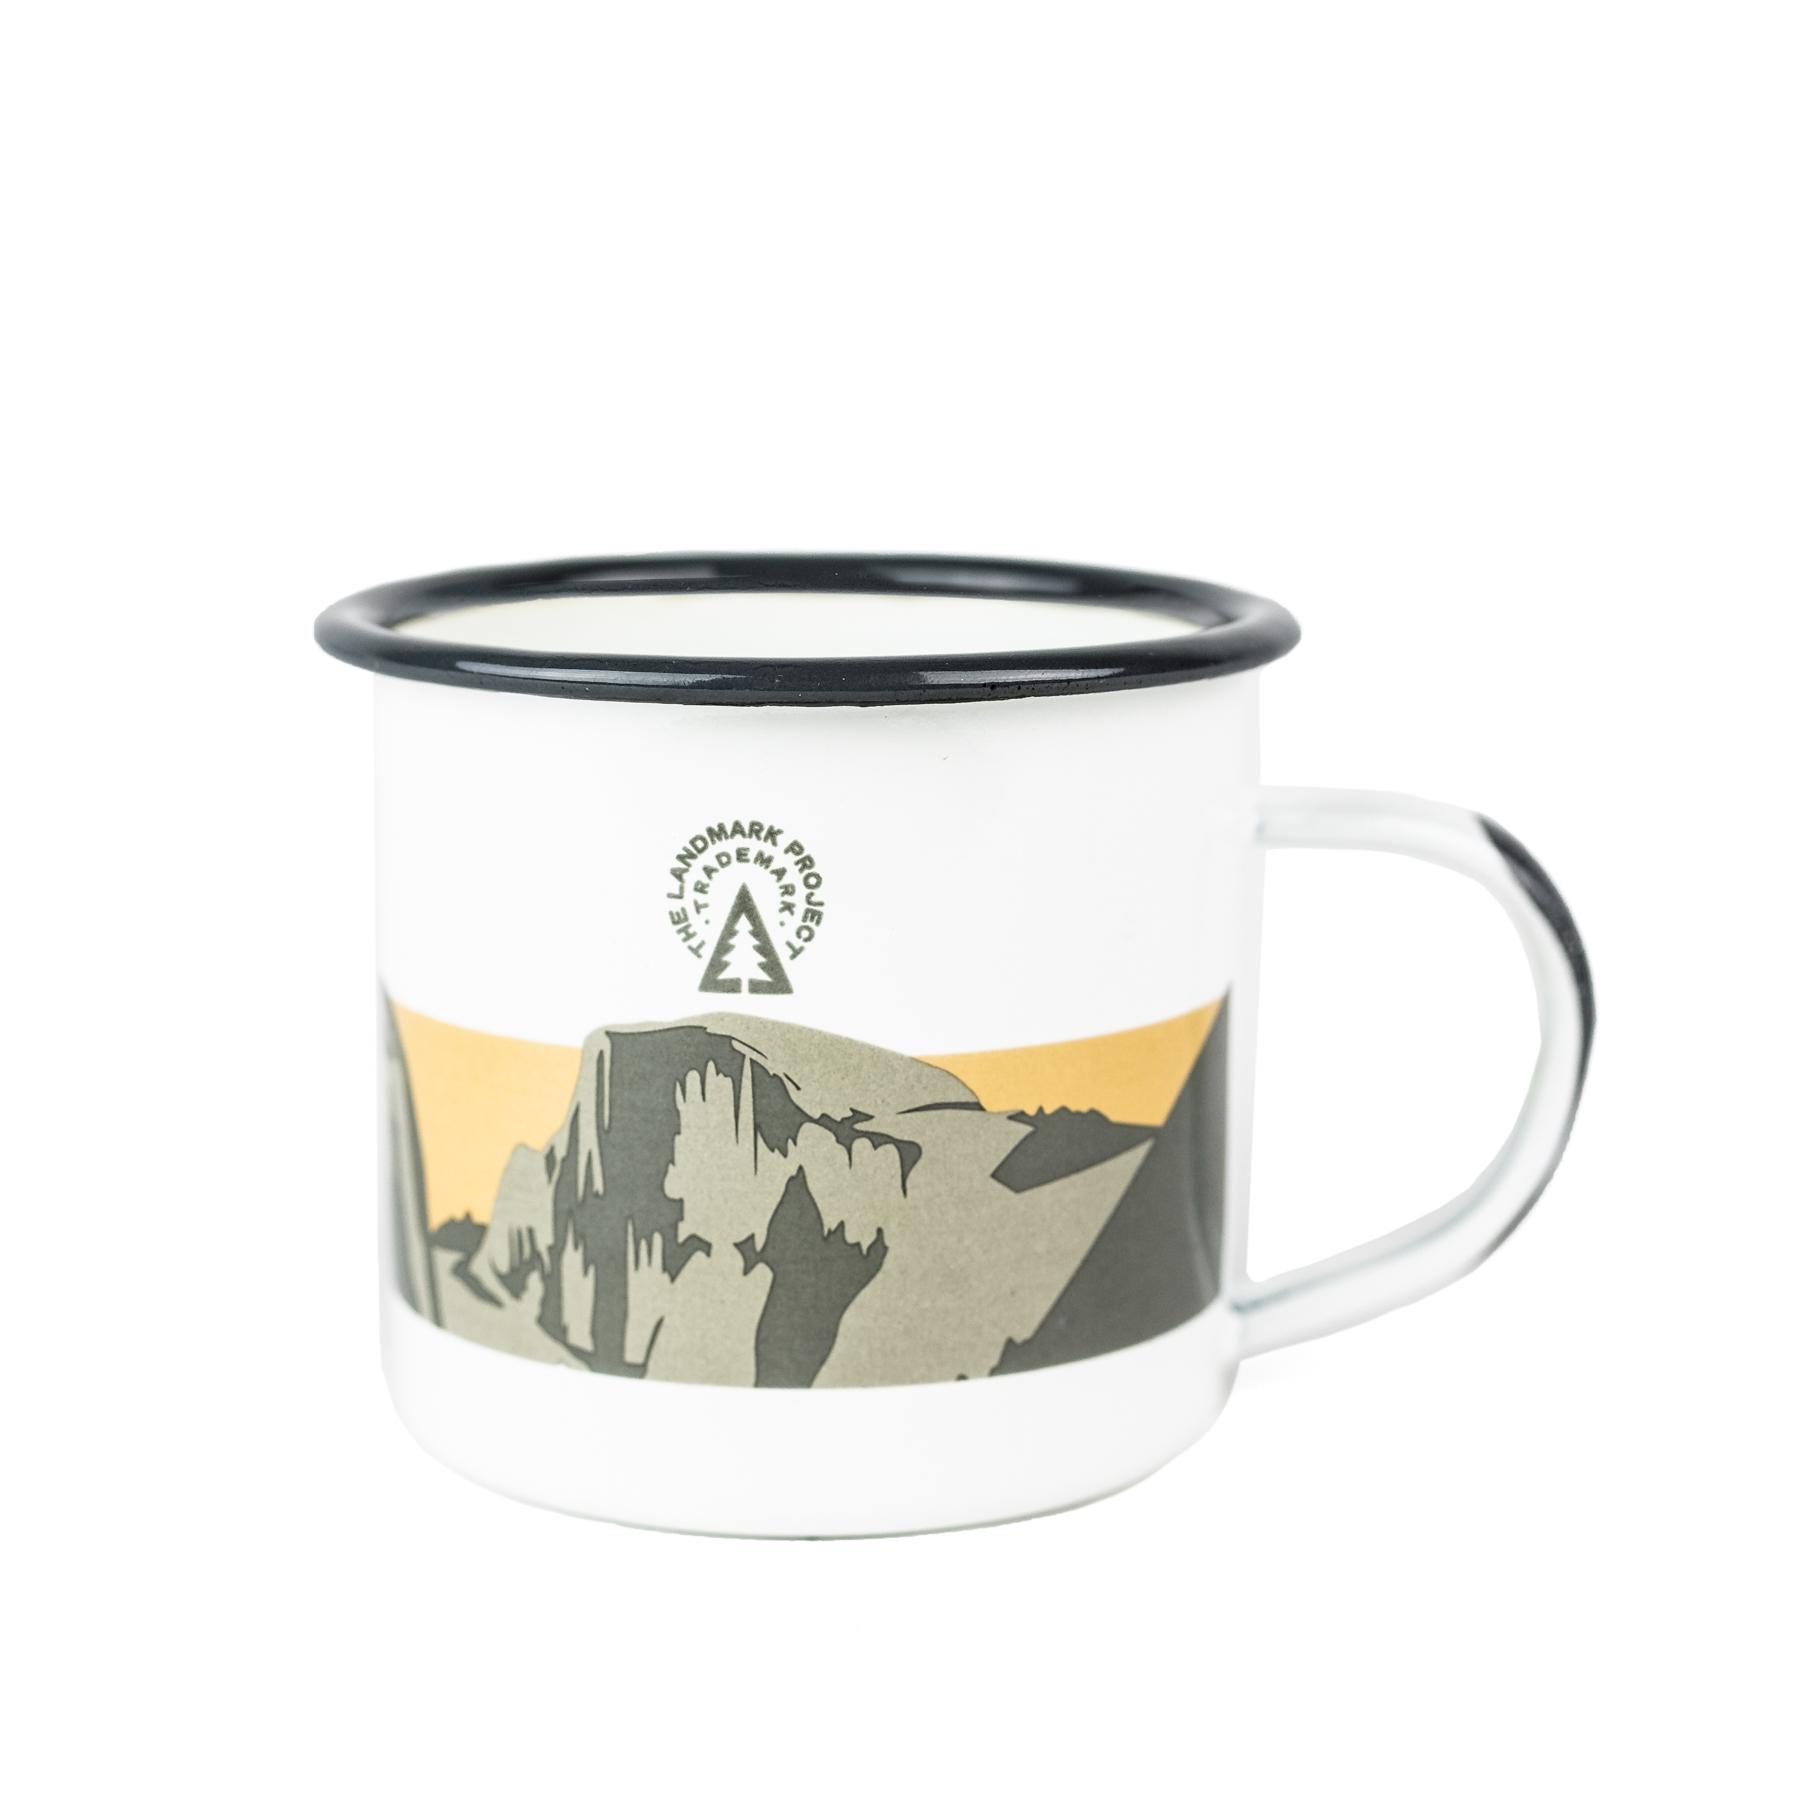 yosemite-enamel-mug-4.jpg